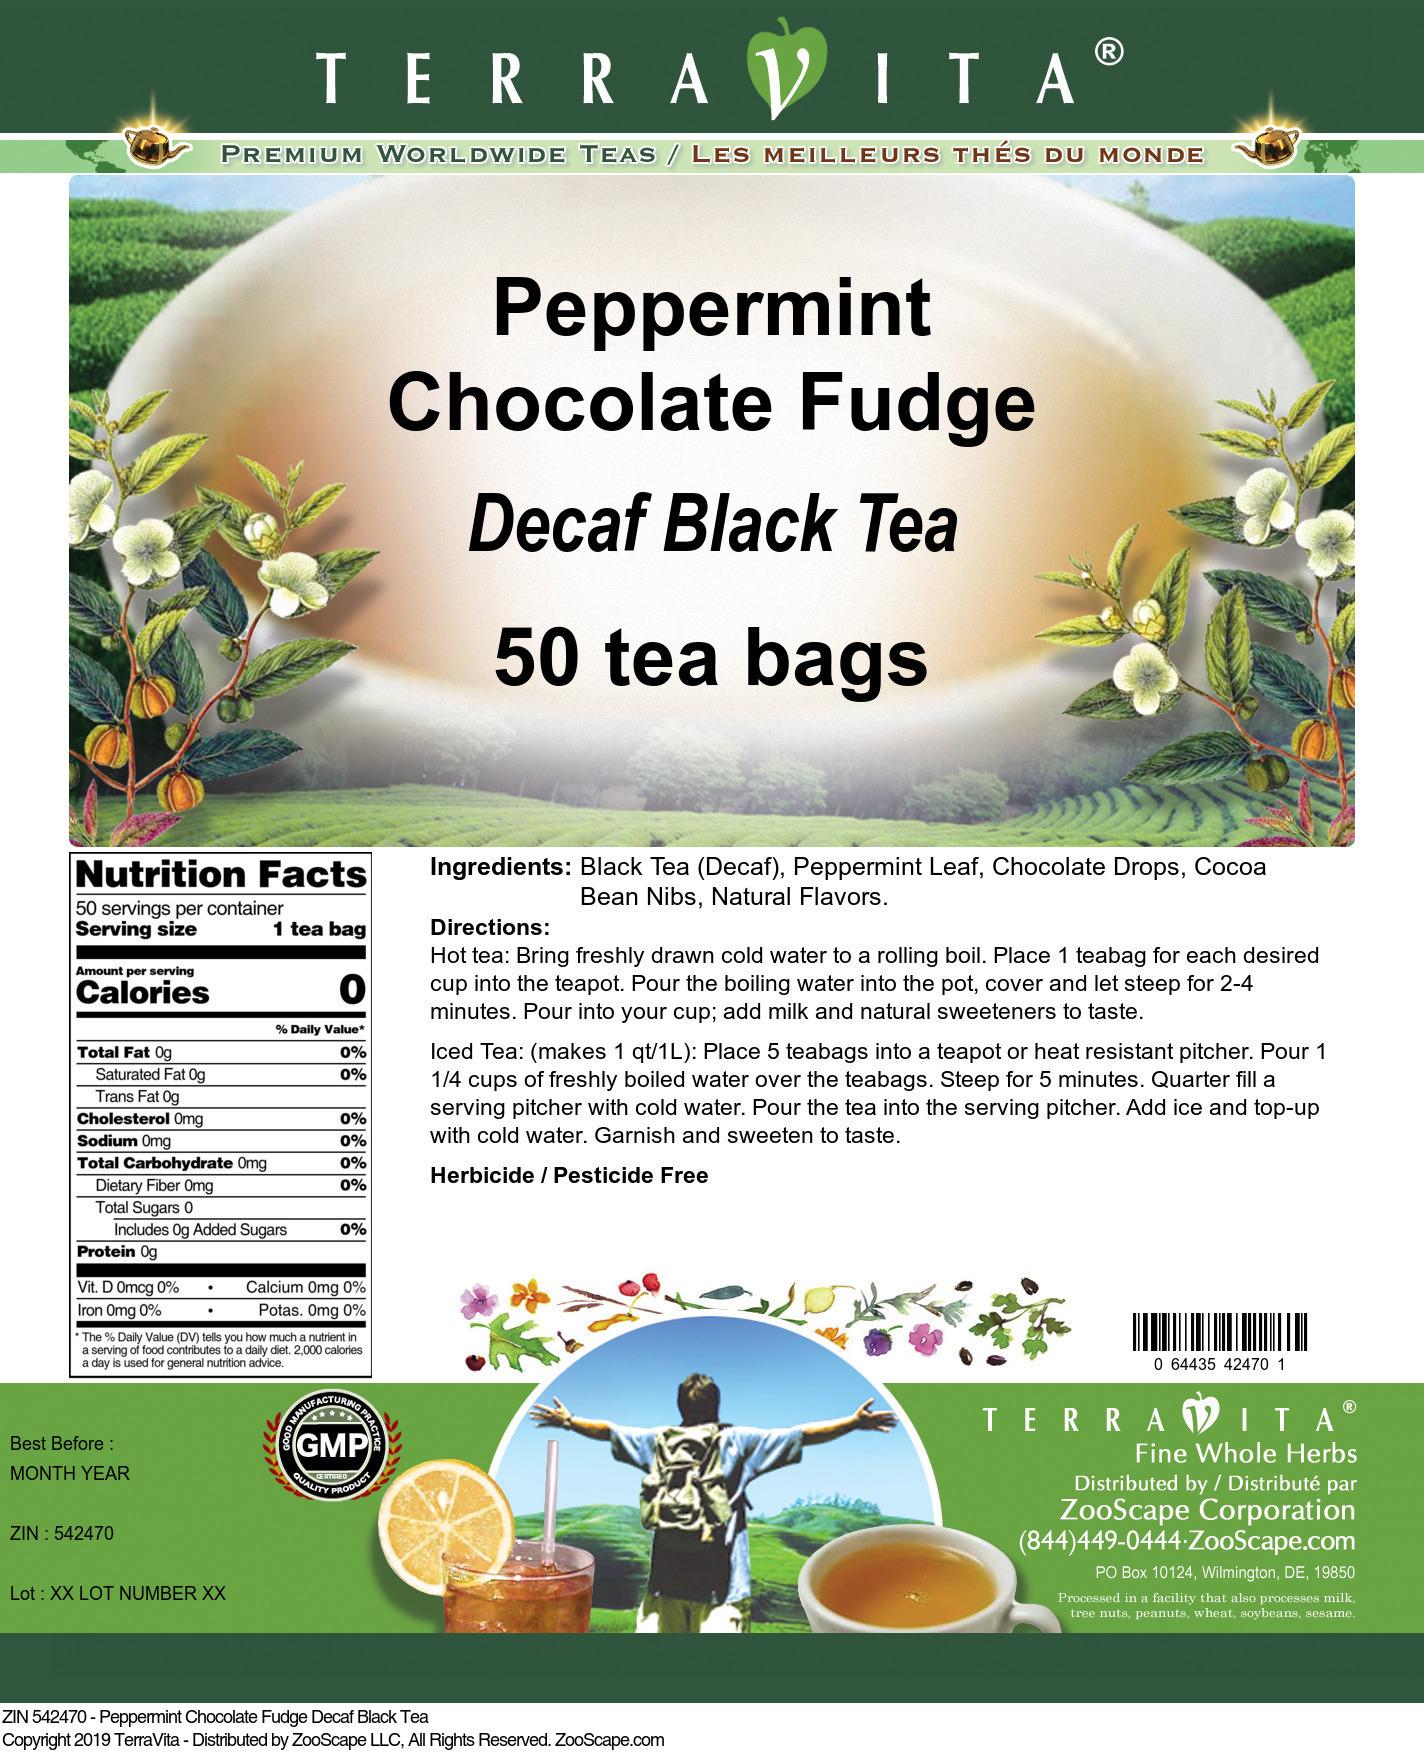 Peppermint Chocolate Fudge Decaf Black Tea